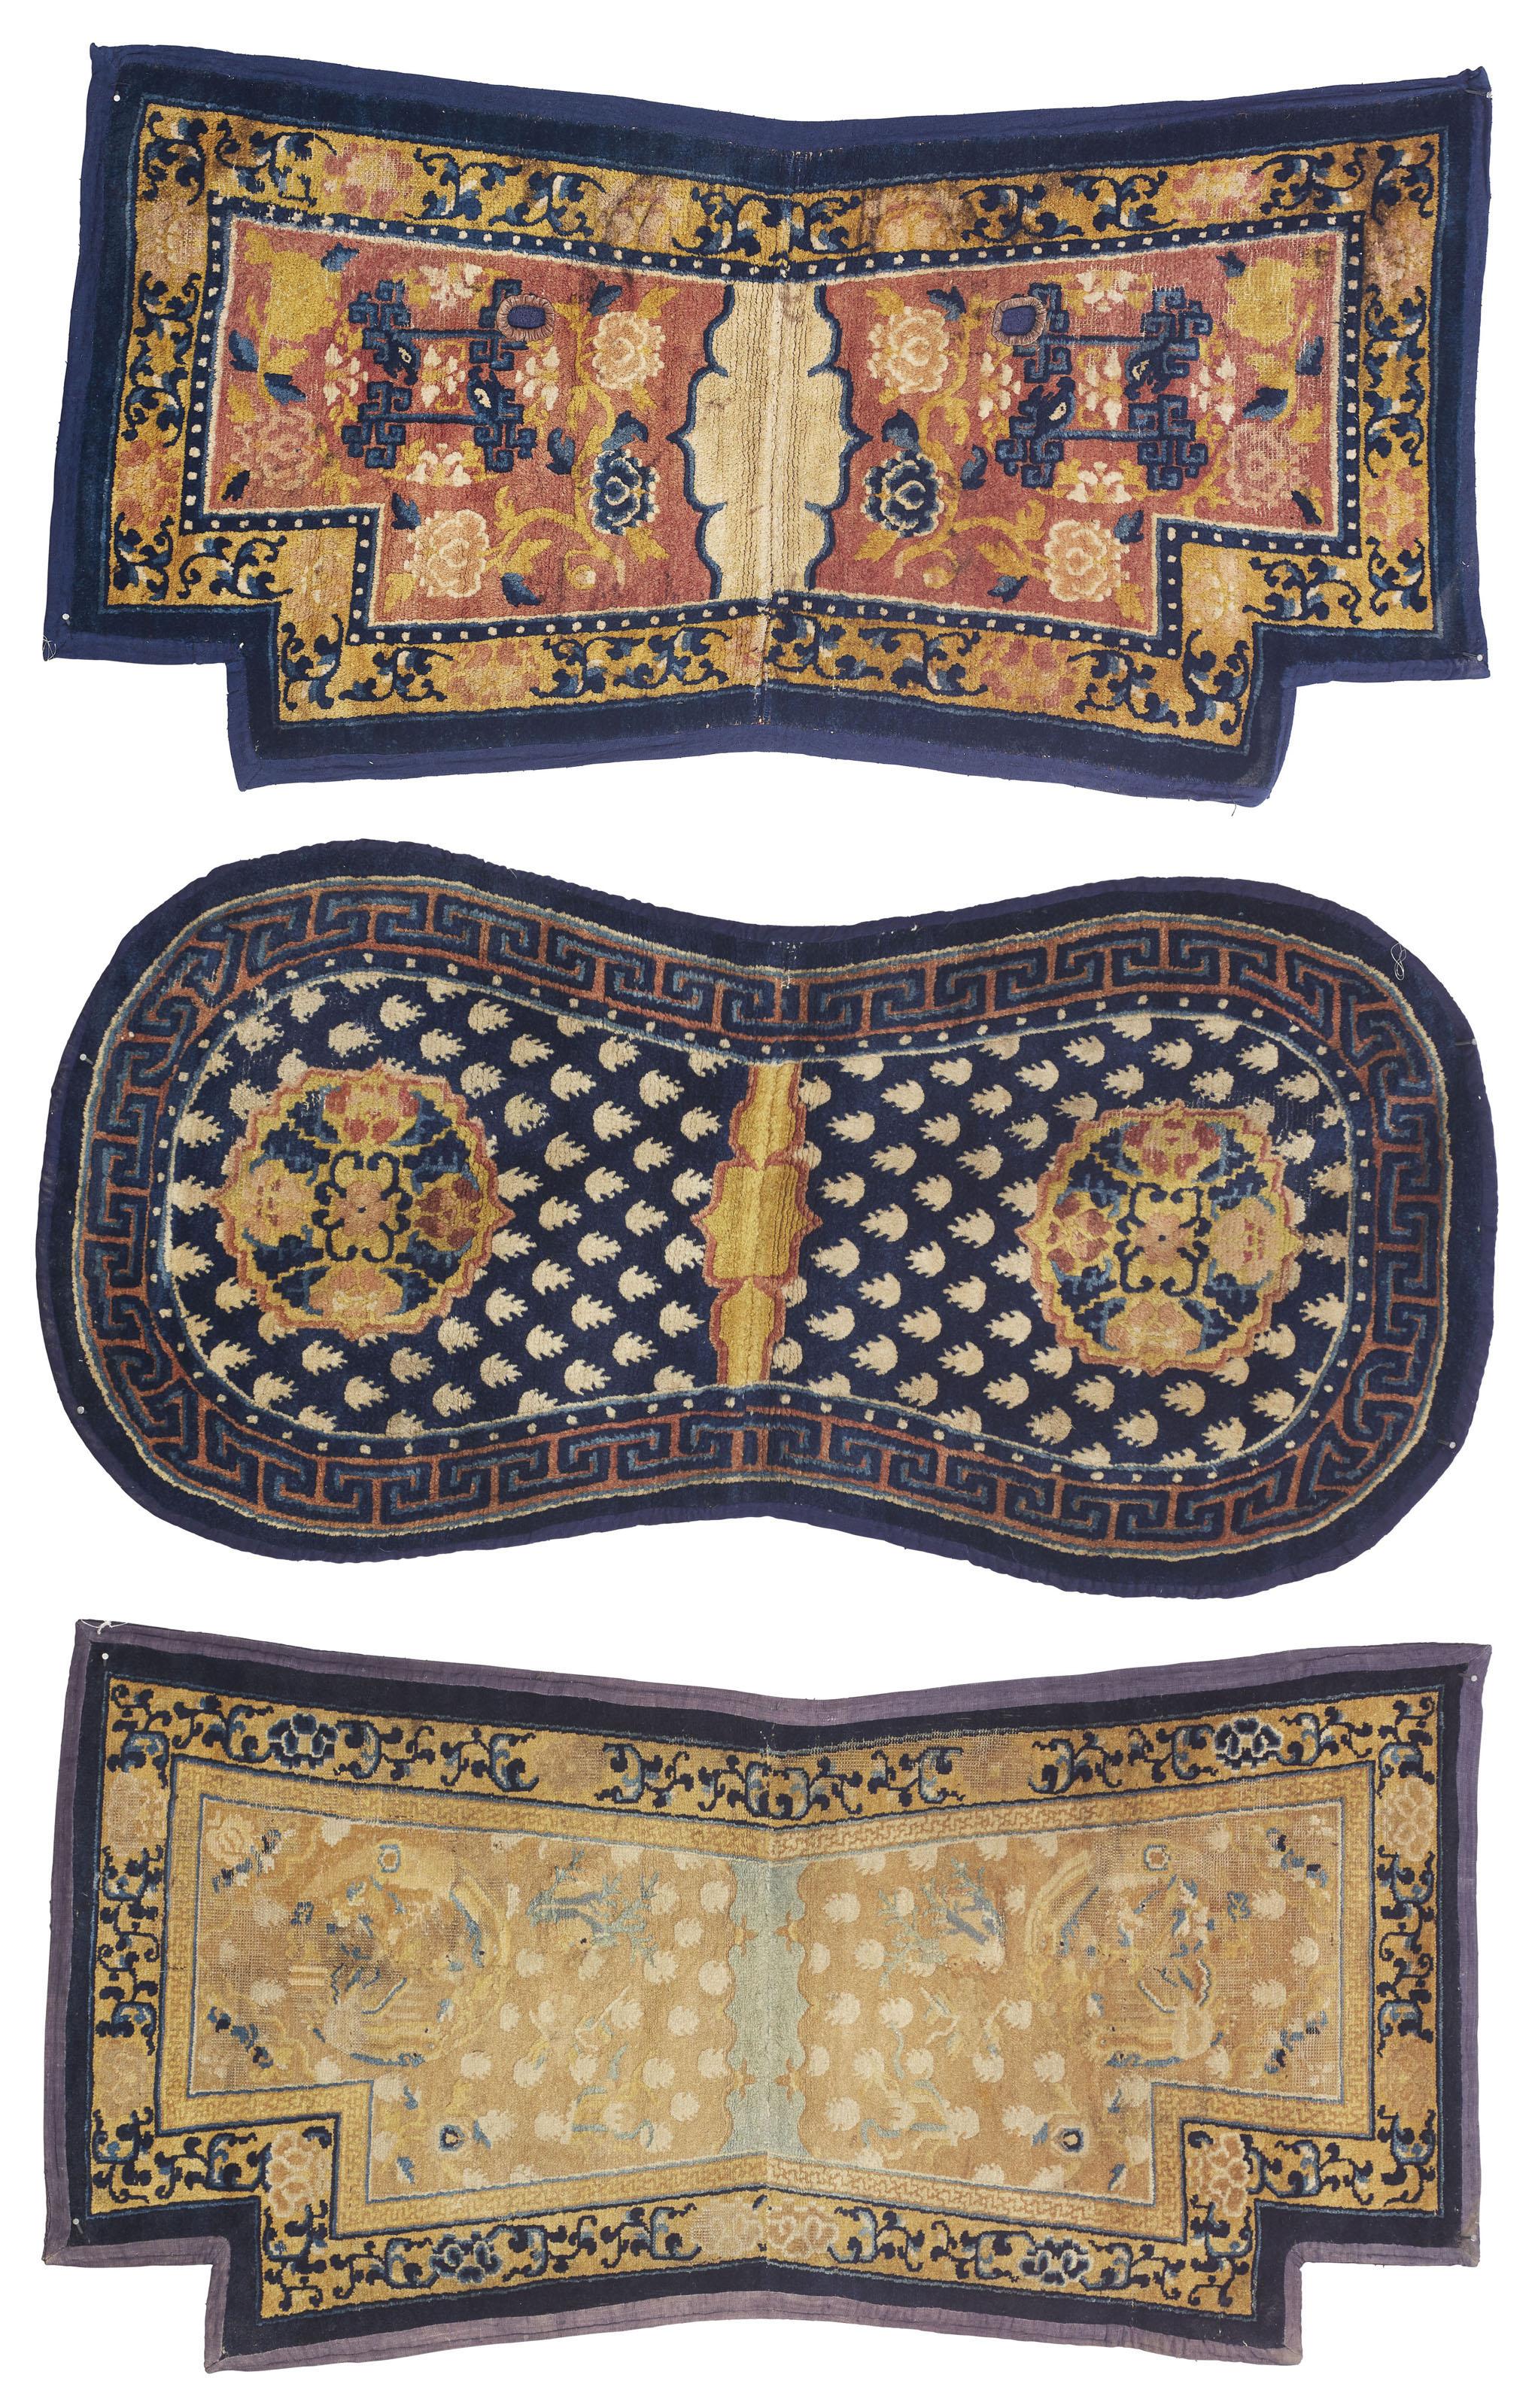 China Qing Dynasty 19th Century